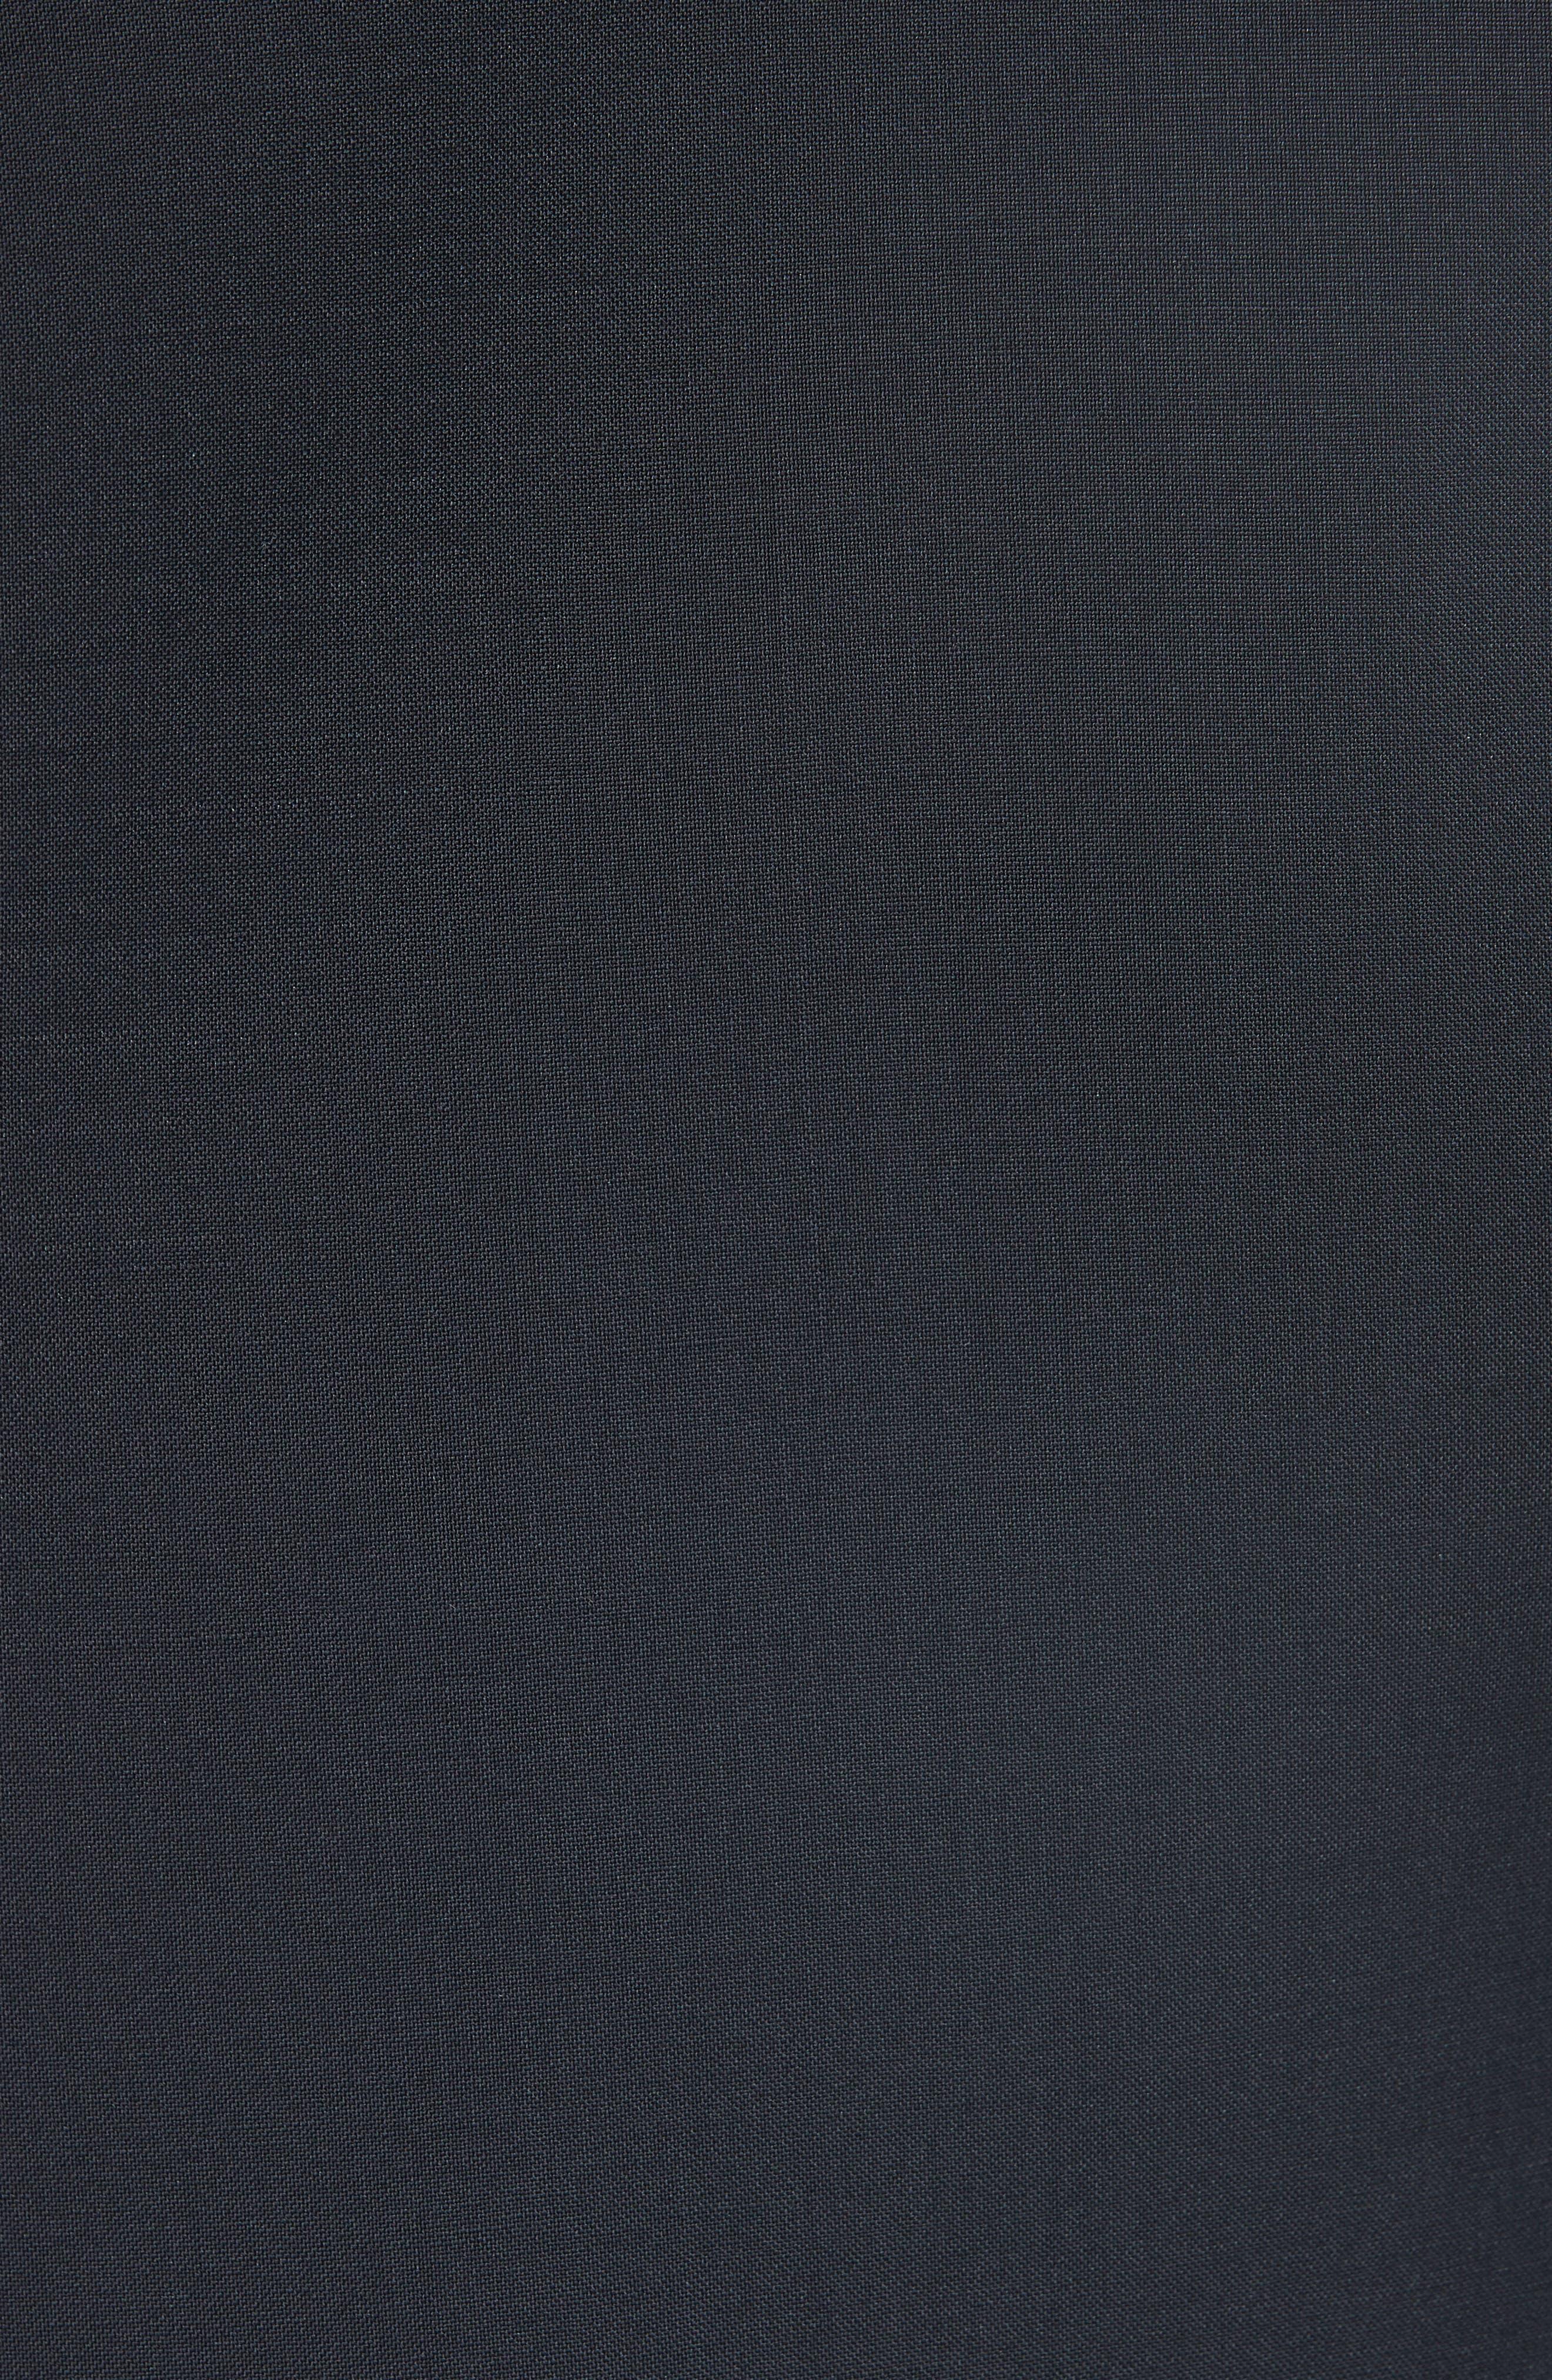 13000 Classic Fit Wool & Mohair Tuxedo,                             Alternate thumbnail 9, color,                             BLACK